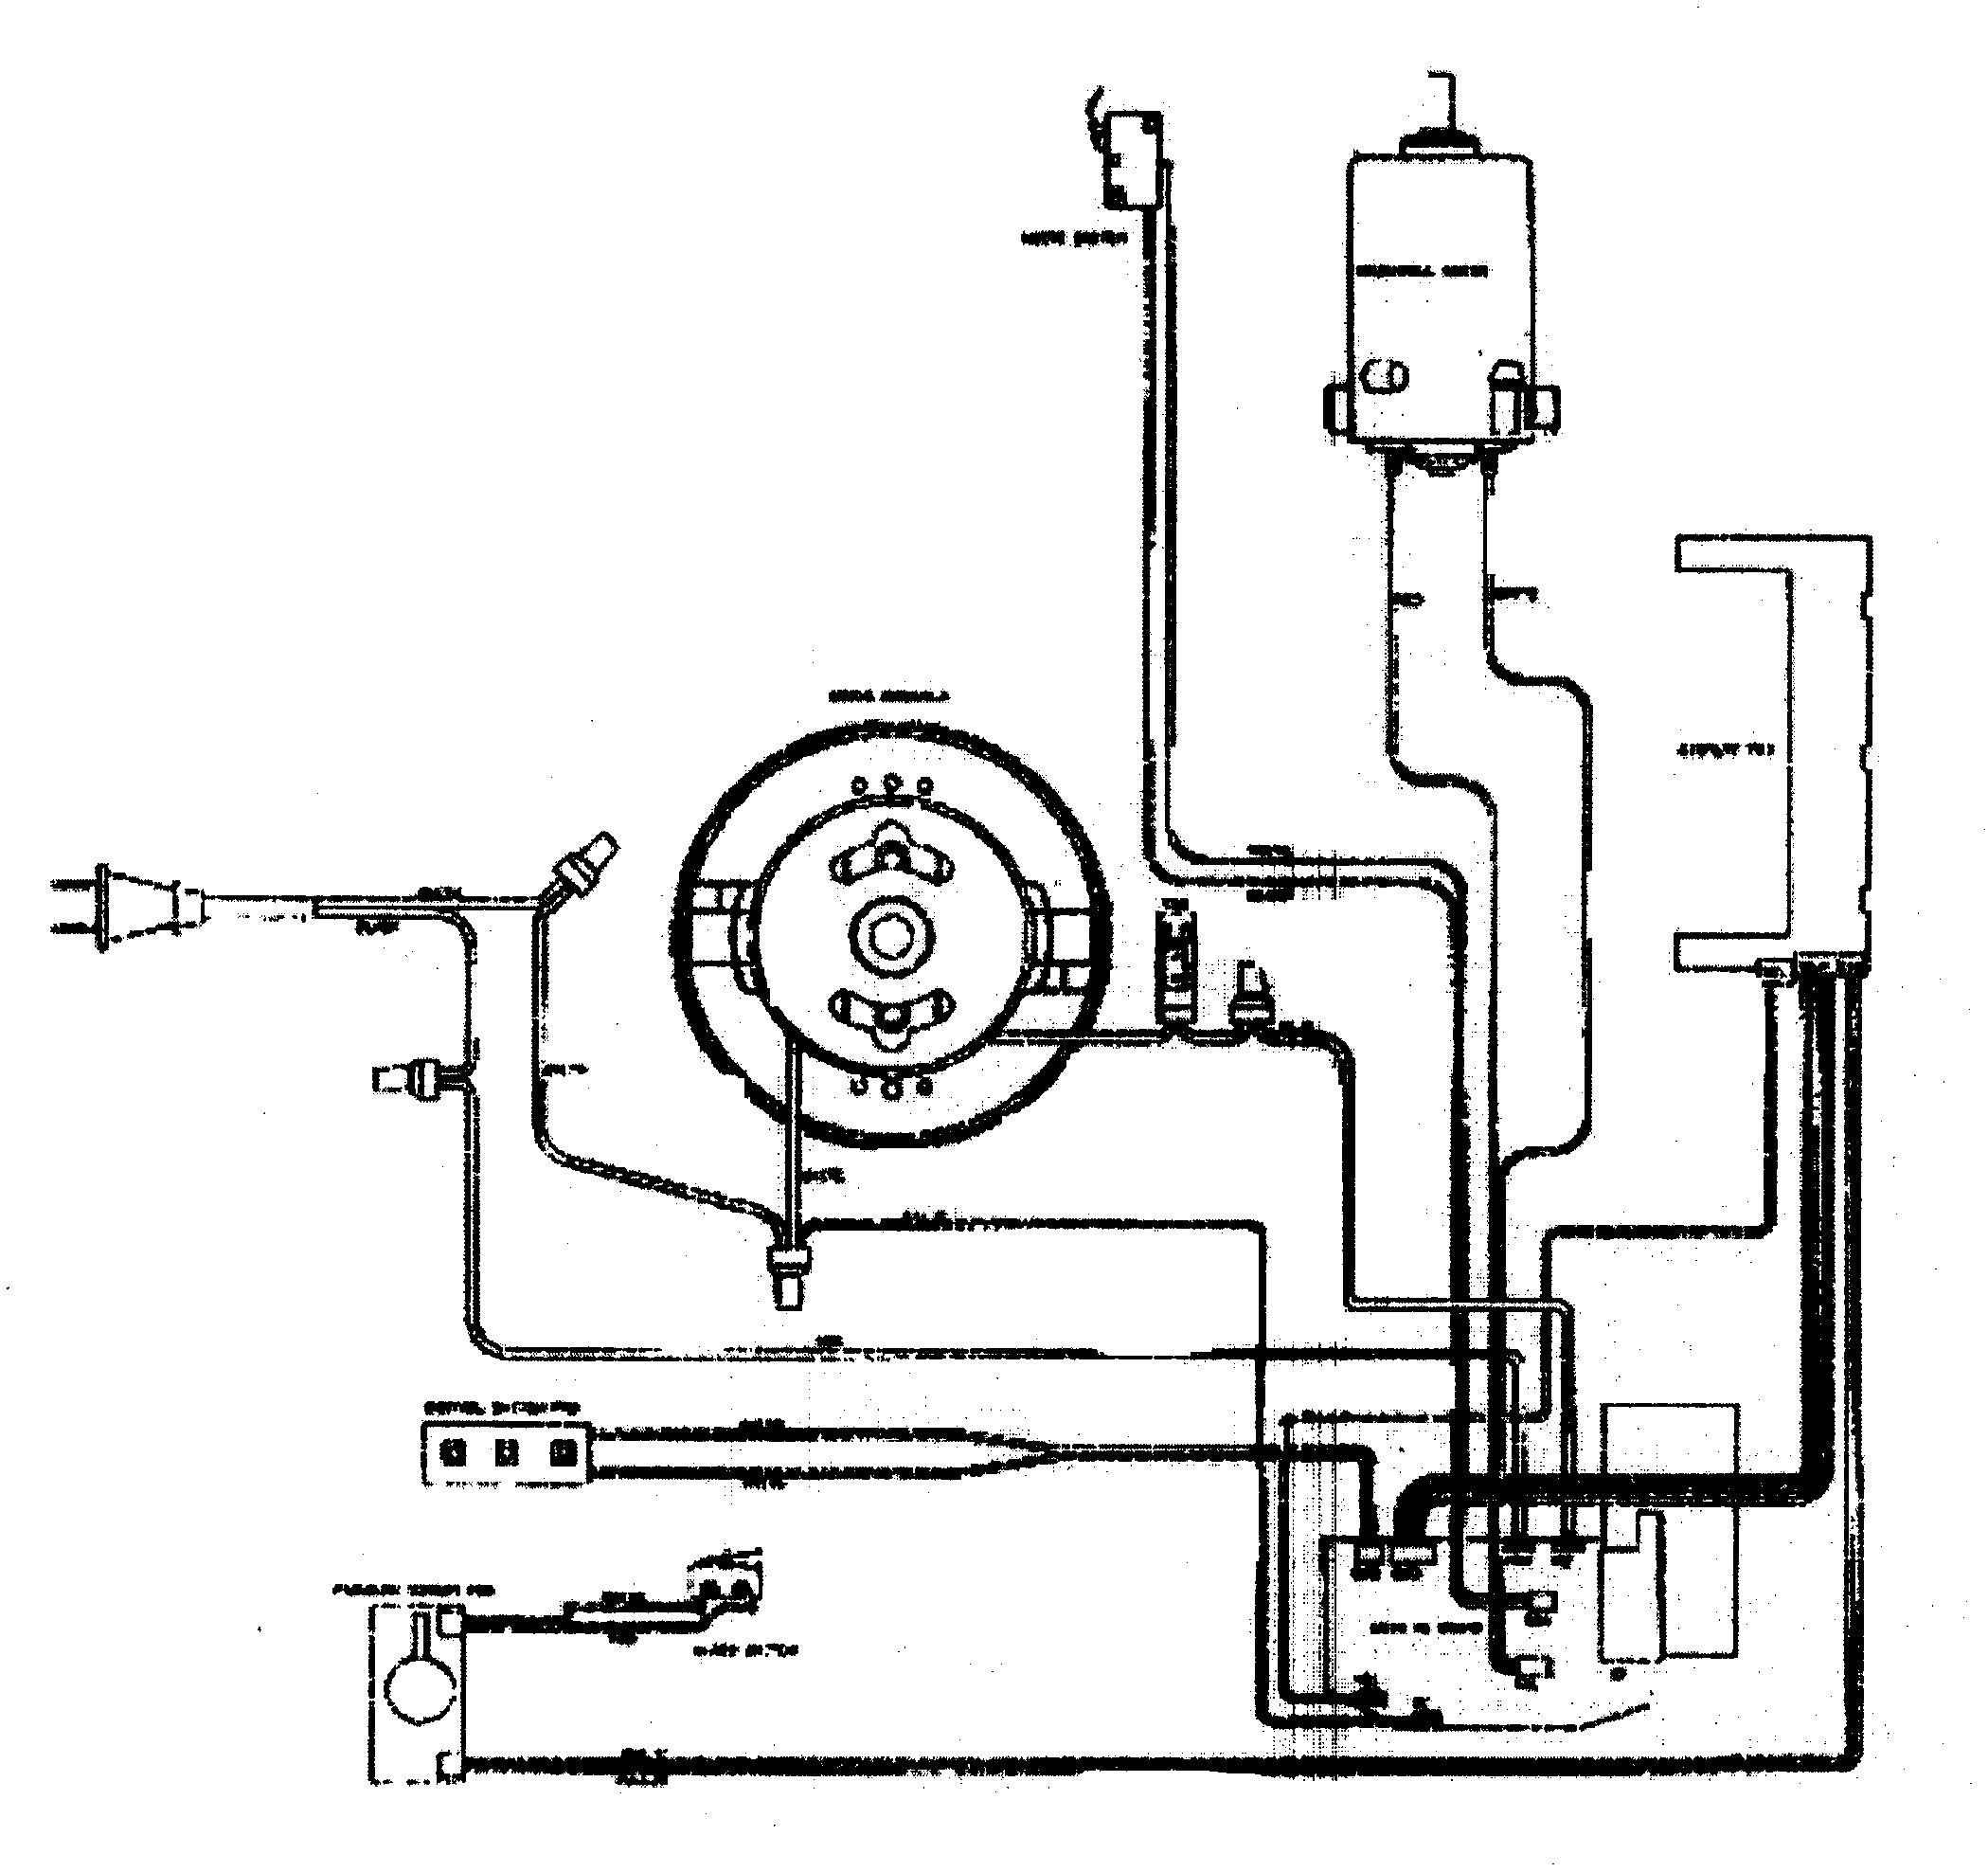 wiring diagram electrolux c1 01 wire center u2022 rh bigshopgo pw